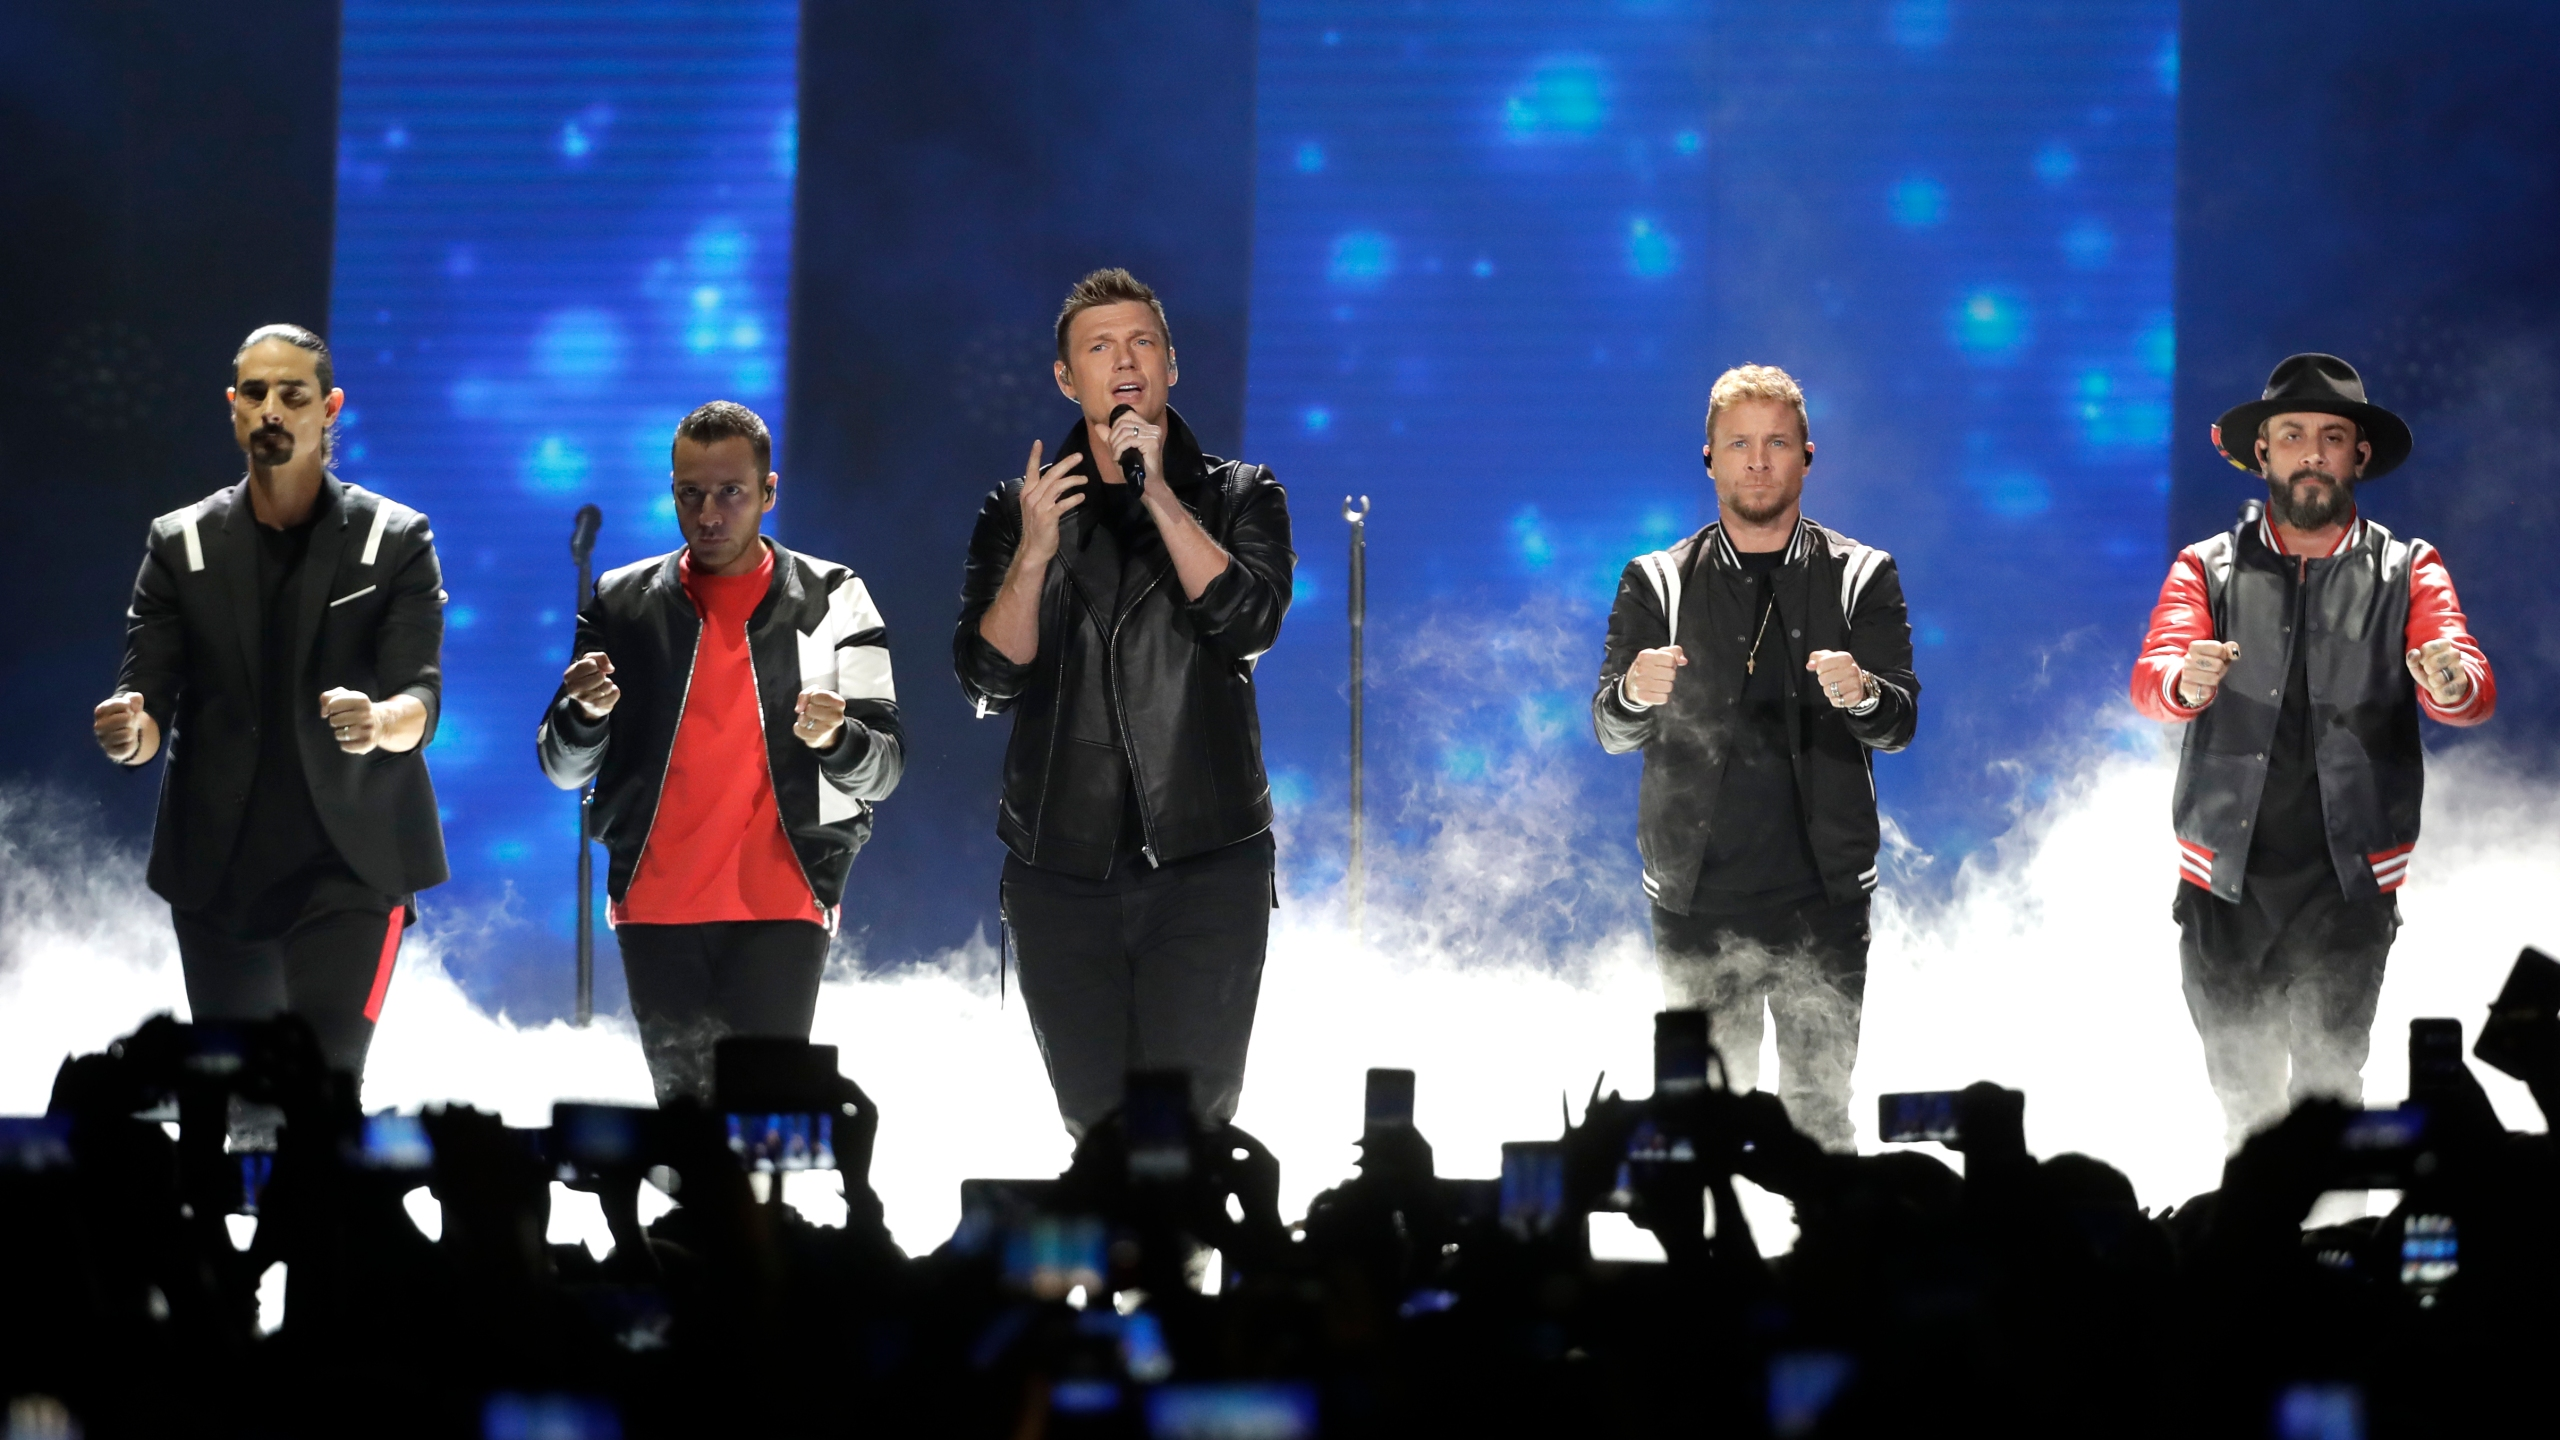 Backstreet_Boys_Concert_Oklahoma_09651-159532.jpg59116866